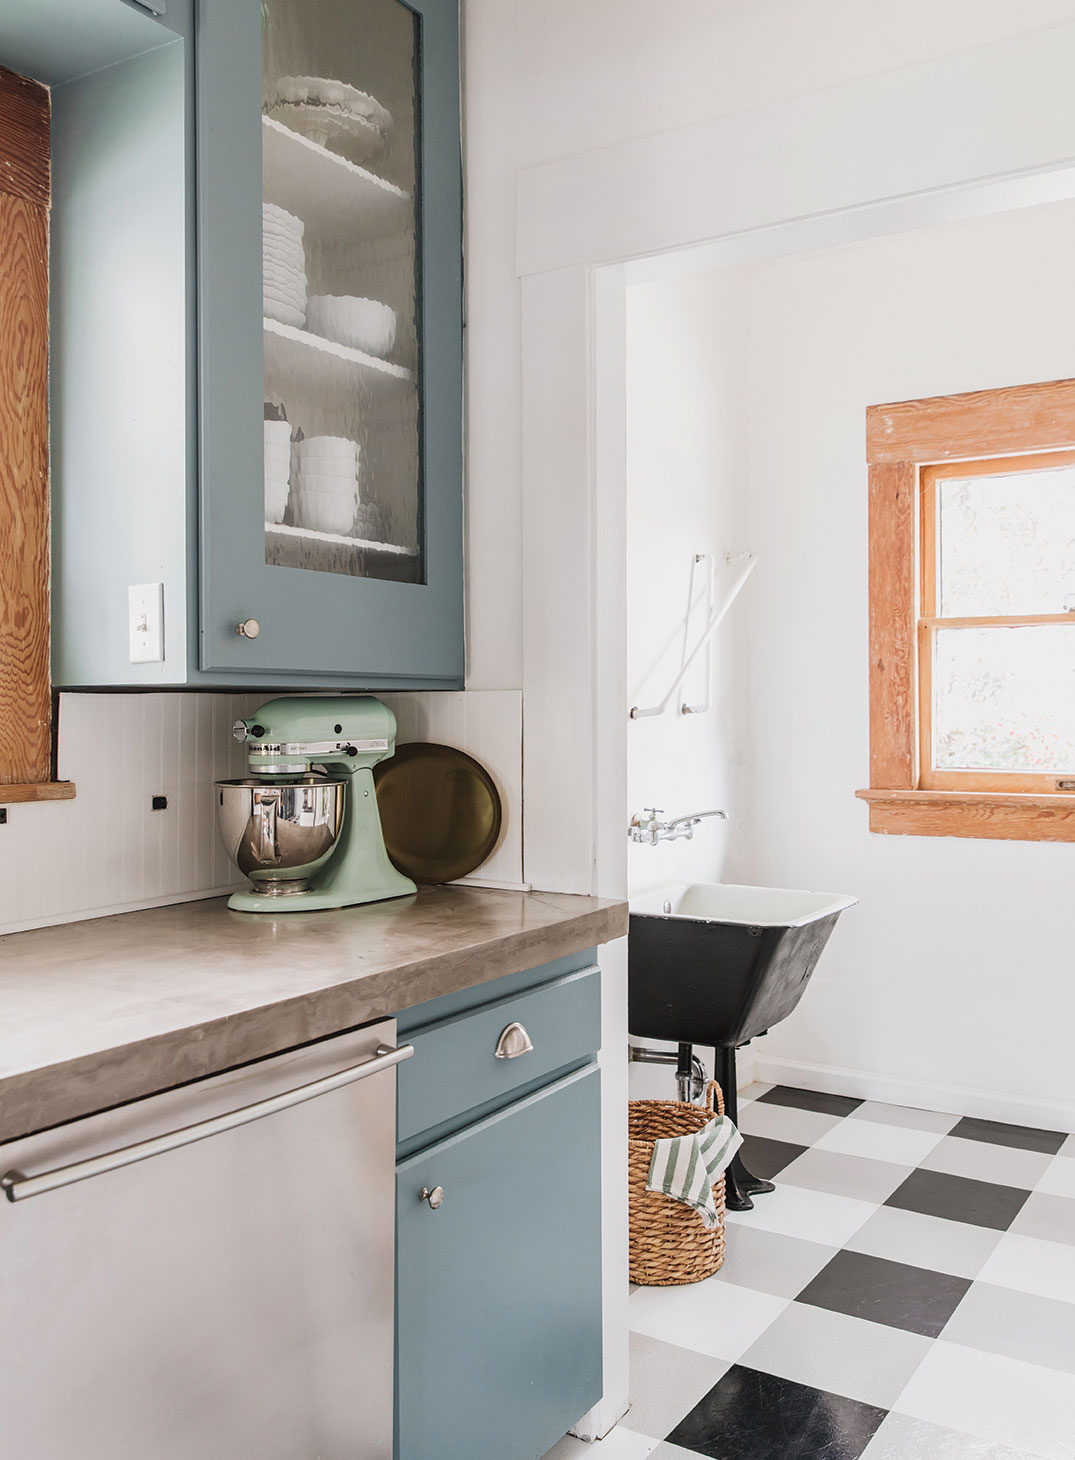 retro sink utility room DIY kitchen